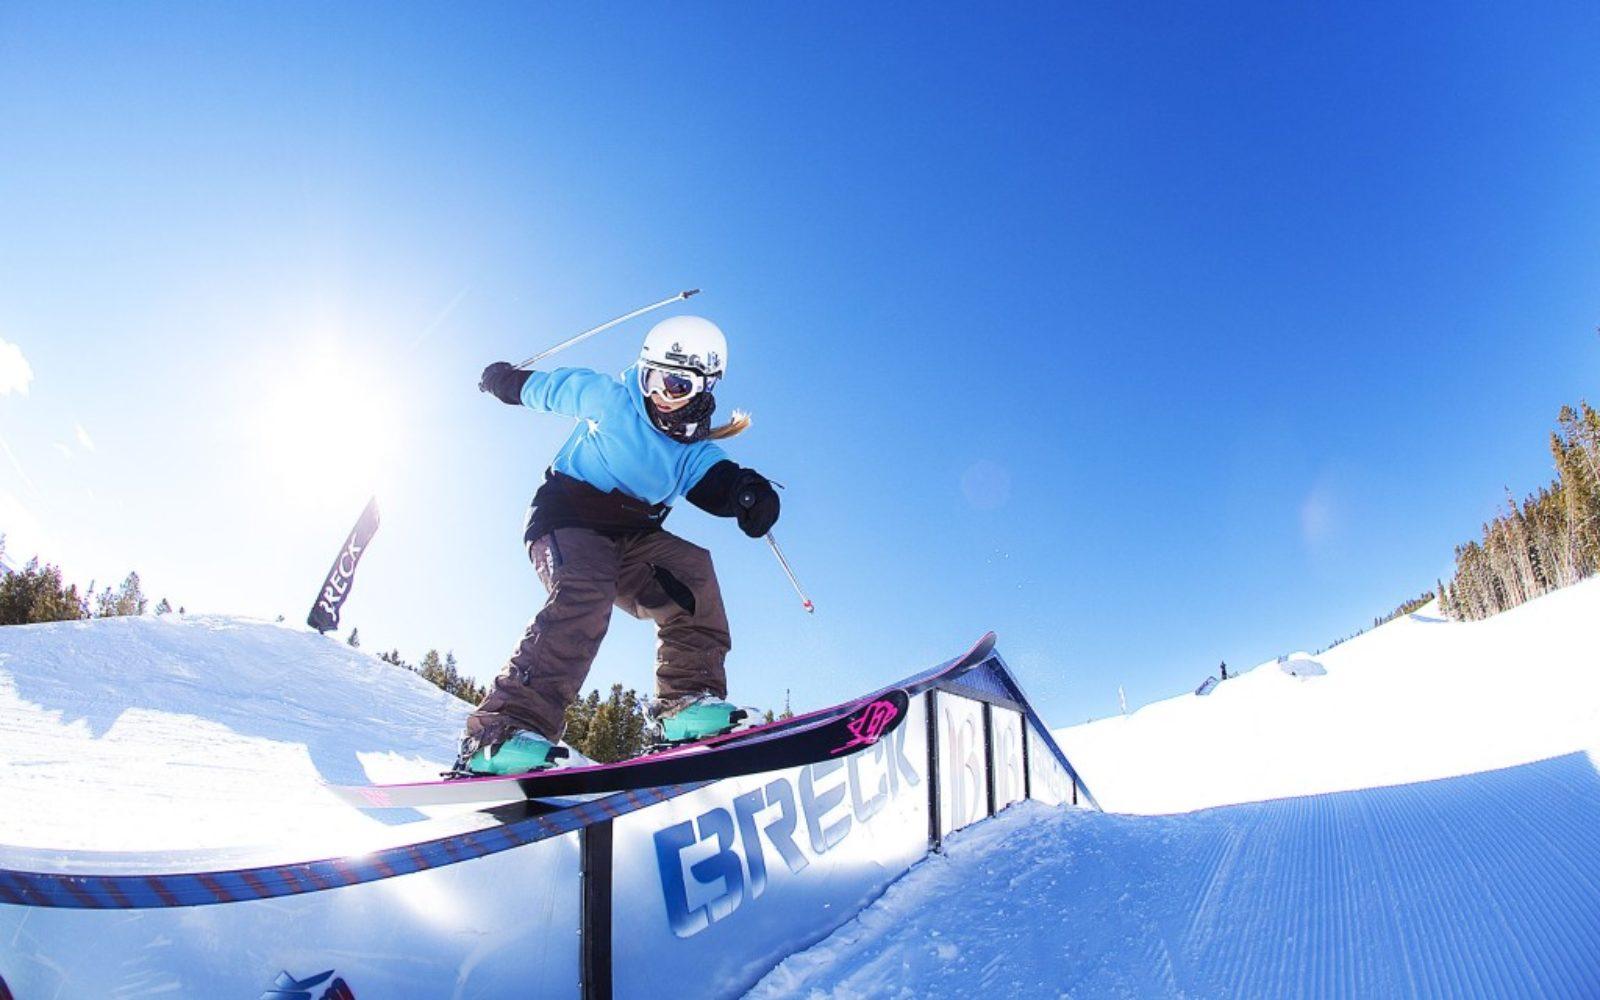 sports-xgames-skier-grind-1024x640